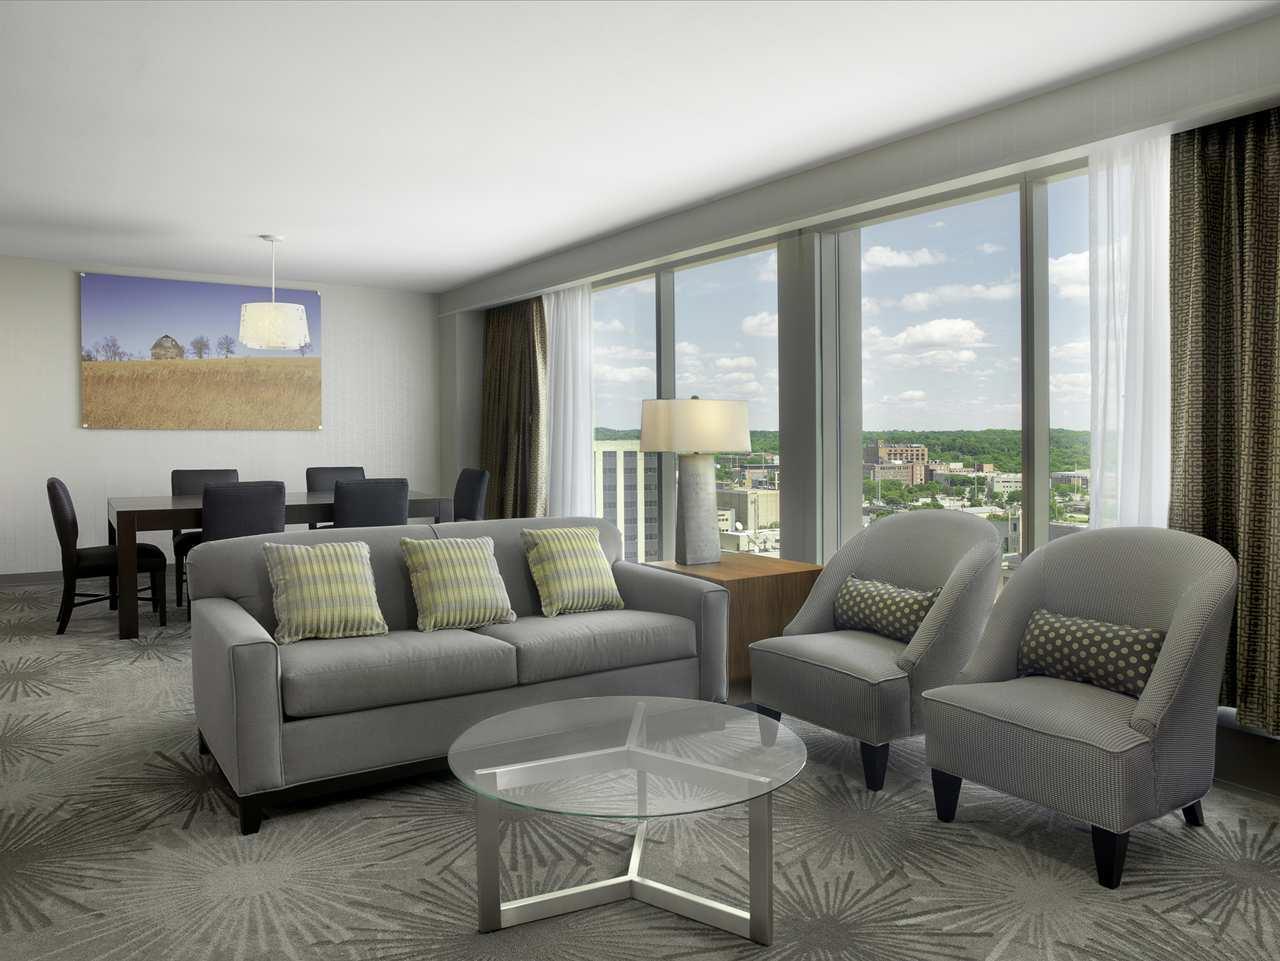 DoubleTree by Hilton Hotel Cedar Rapids Convention Complex image 16